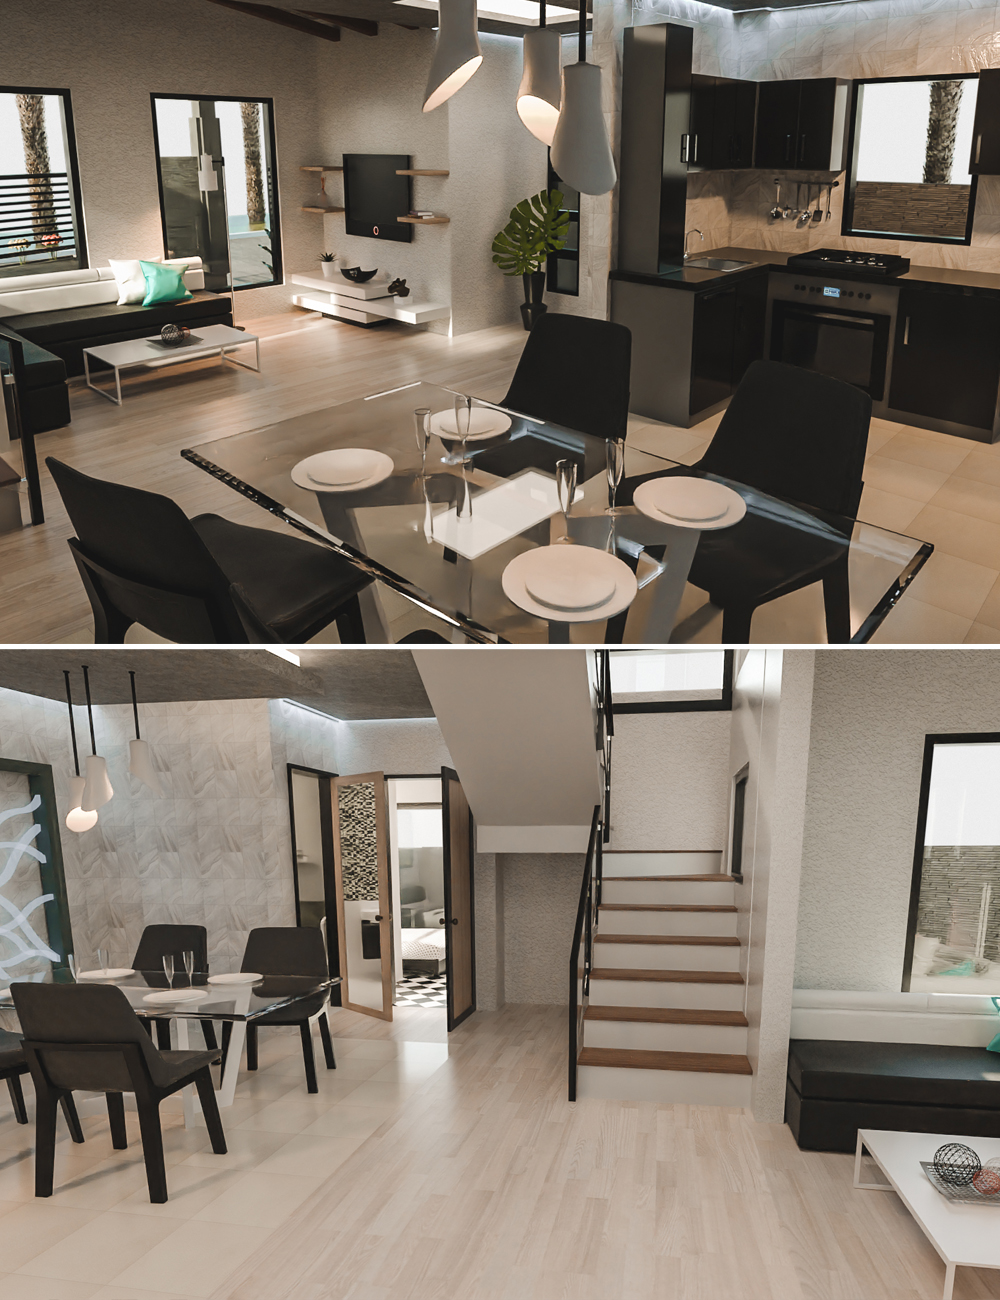 Corner Lot House by: Tesla3dCorp, 3D Models by Daz 3D